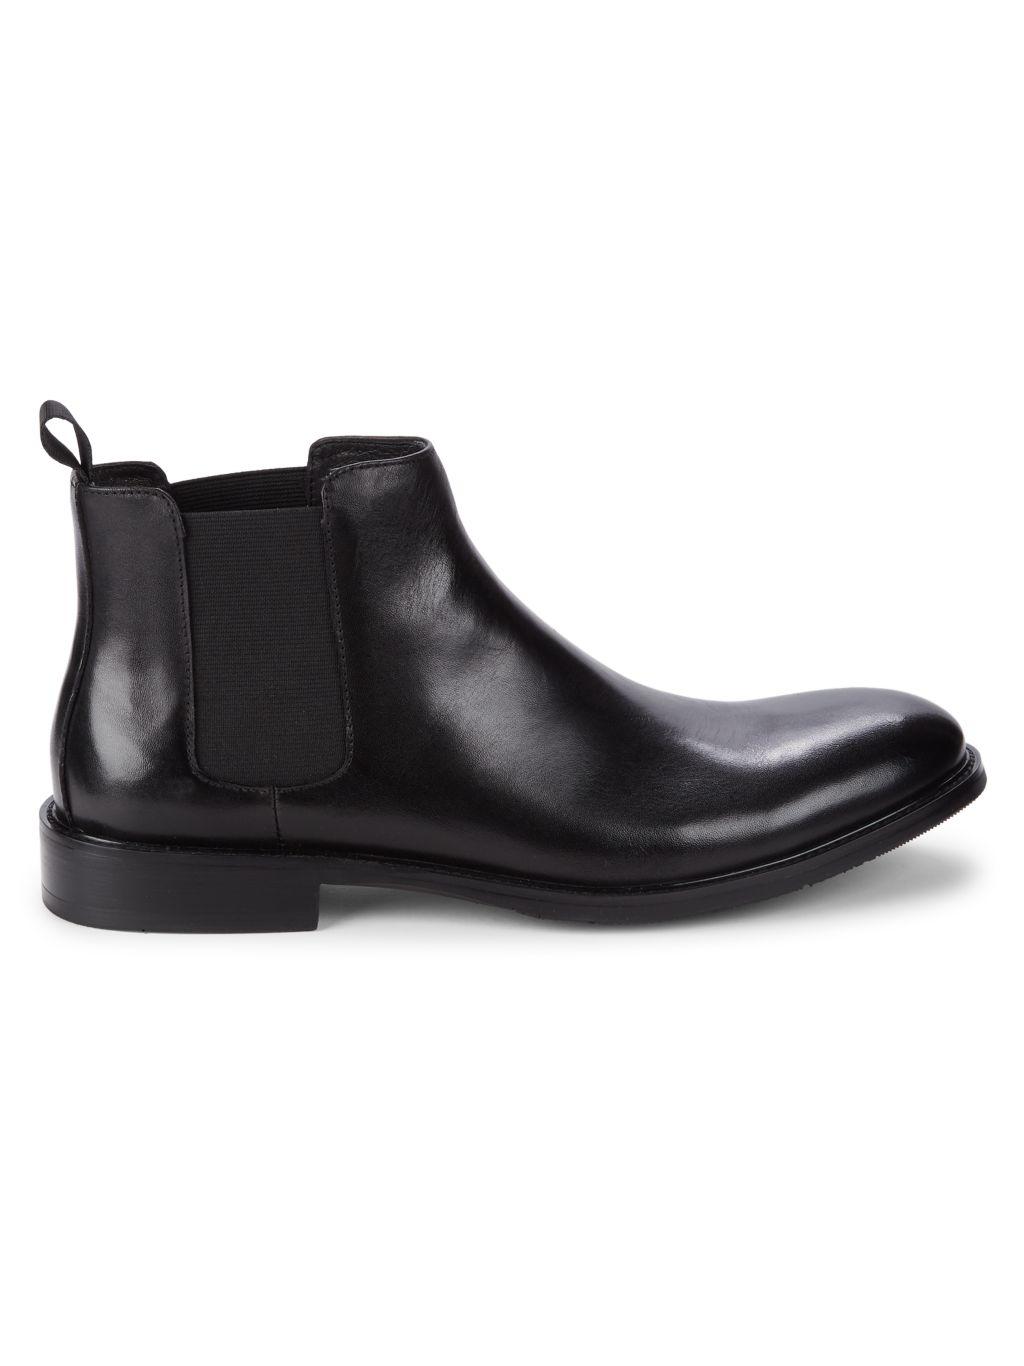 Robert Graham Metropolis Leather Chelsea Boots